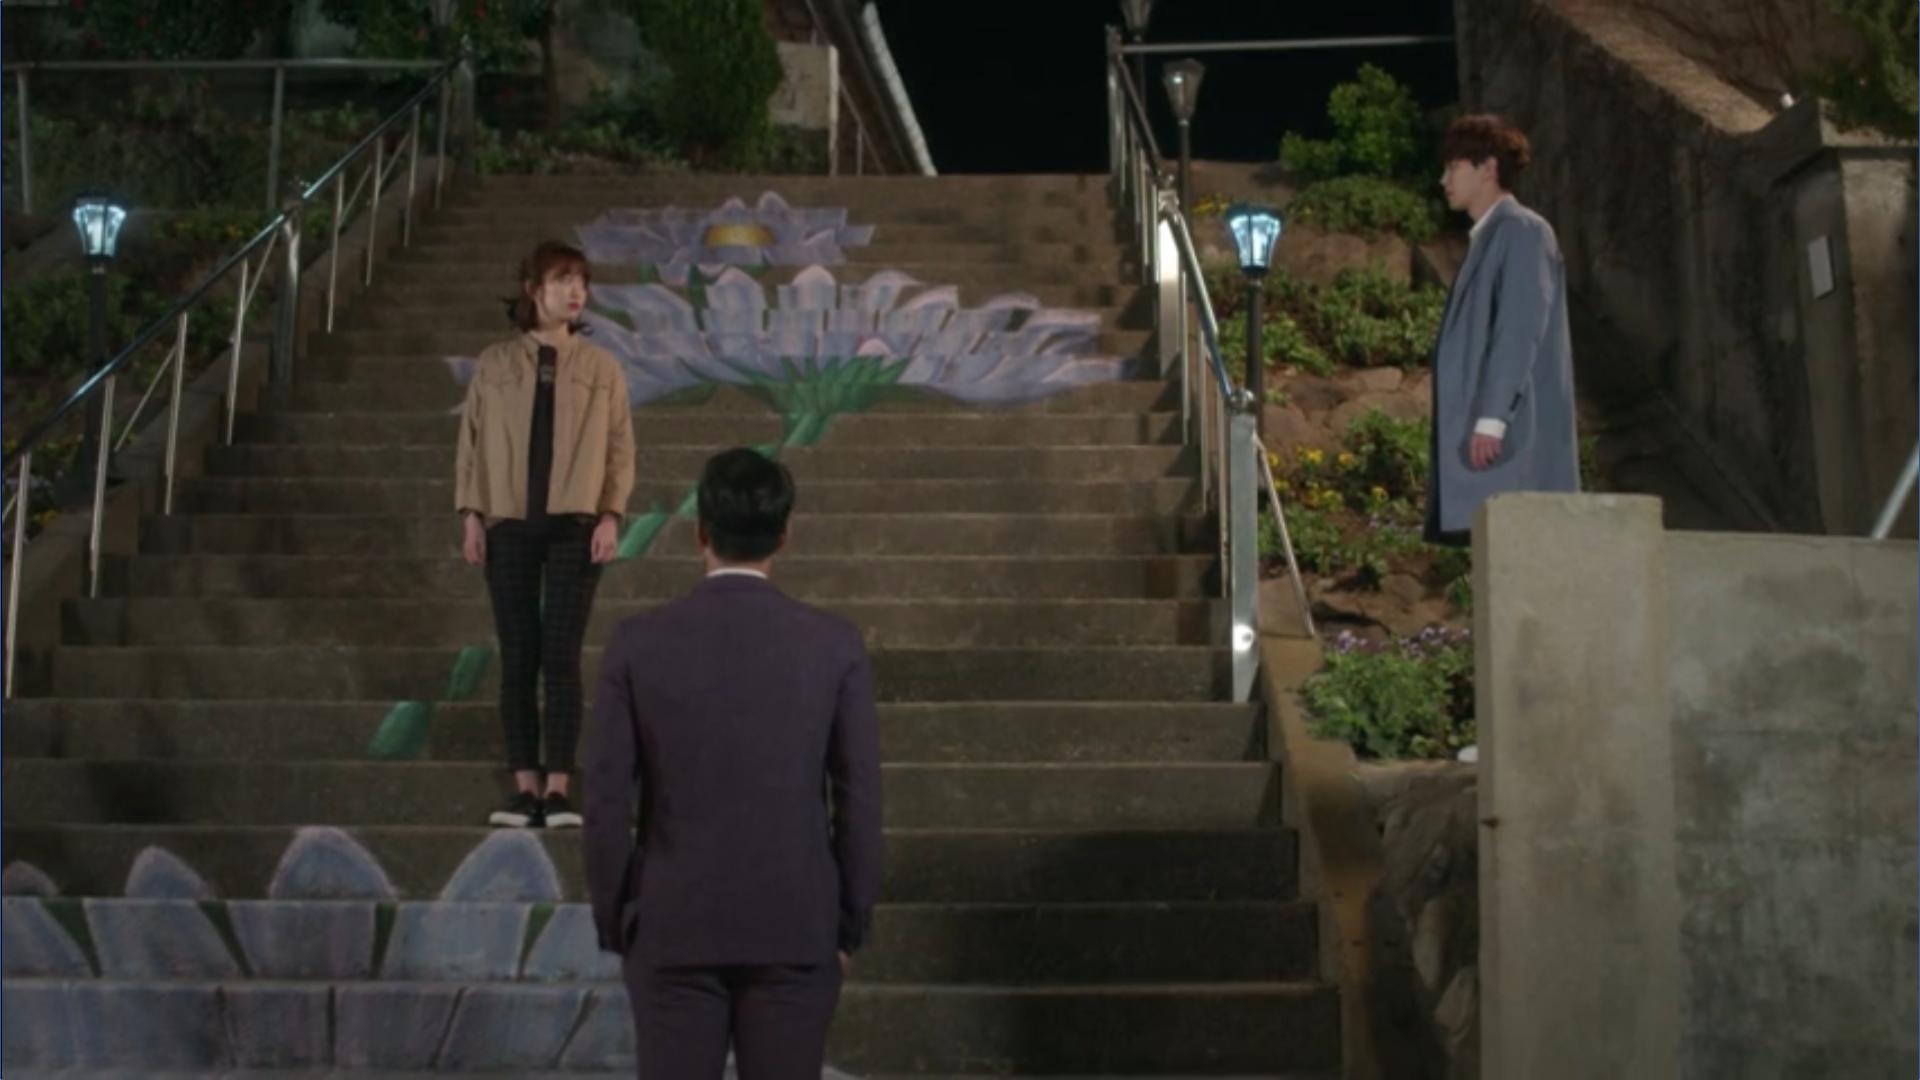 Wednesday 3:30 PM Yoon Jae-won, Seon Eun-woo, and Baek Seung-gyu